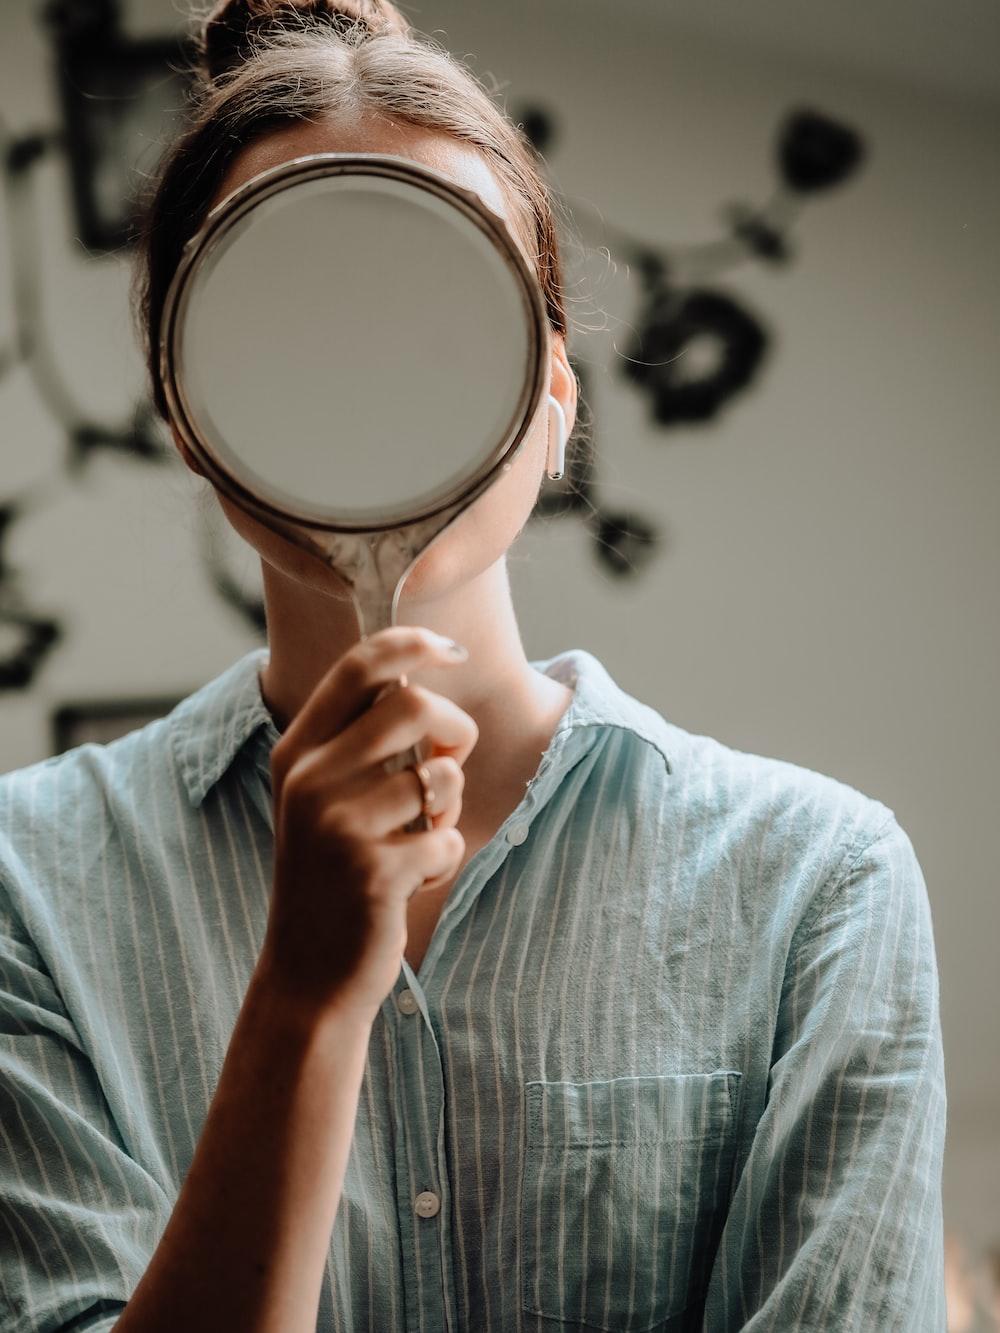 person in blue crew neck shirt holding brown round mirror